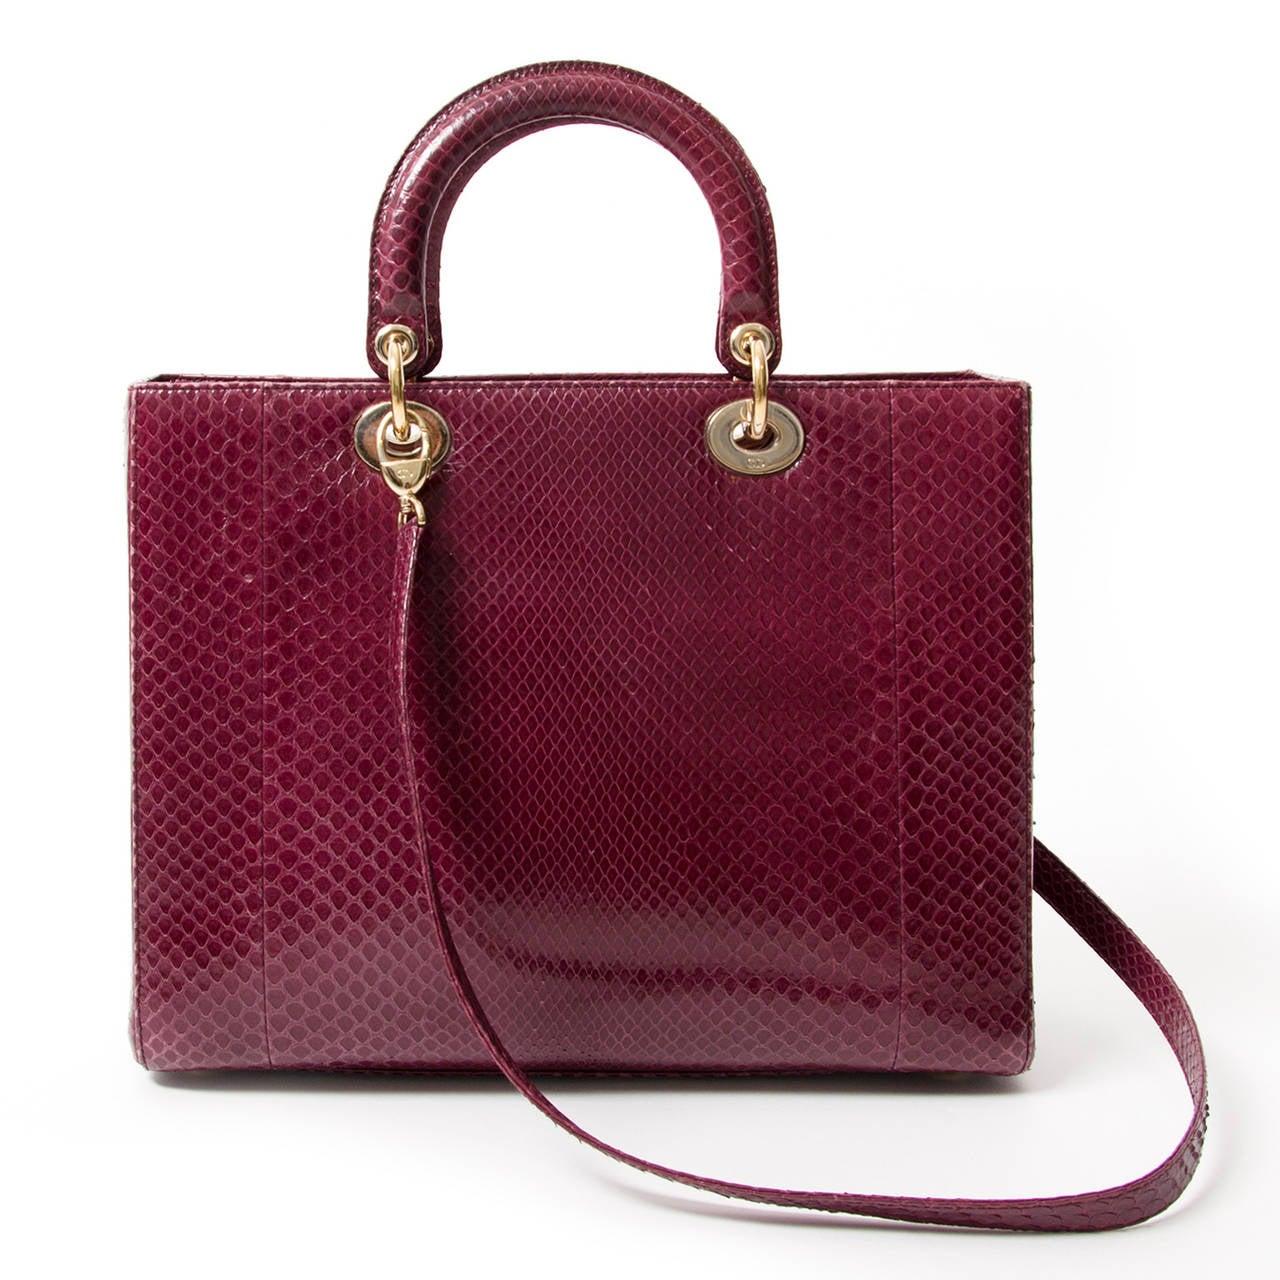 Brown Lady Dior Mauve Python Bag For Sale